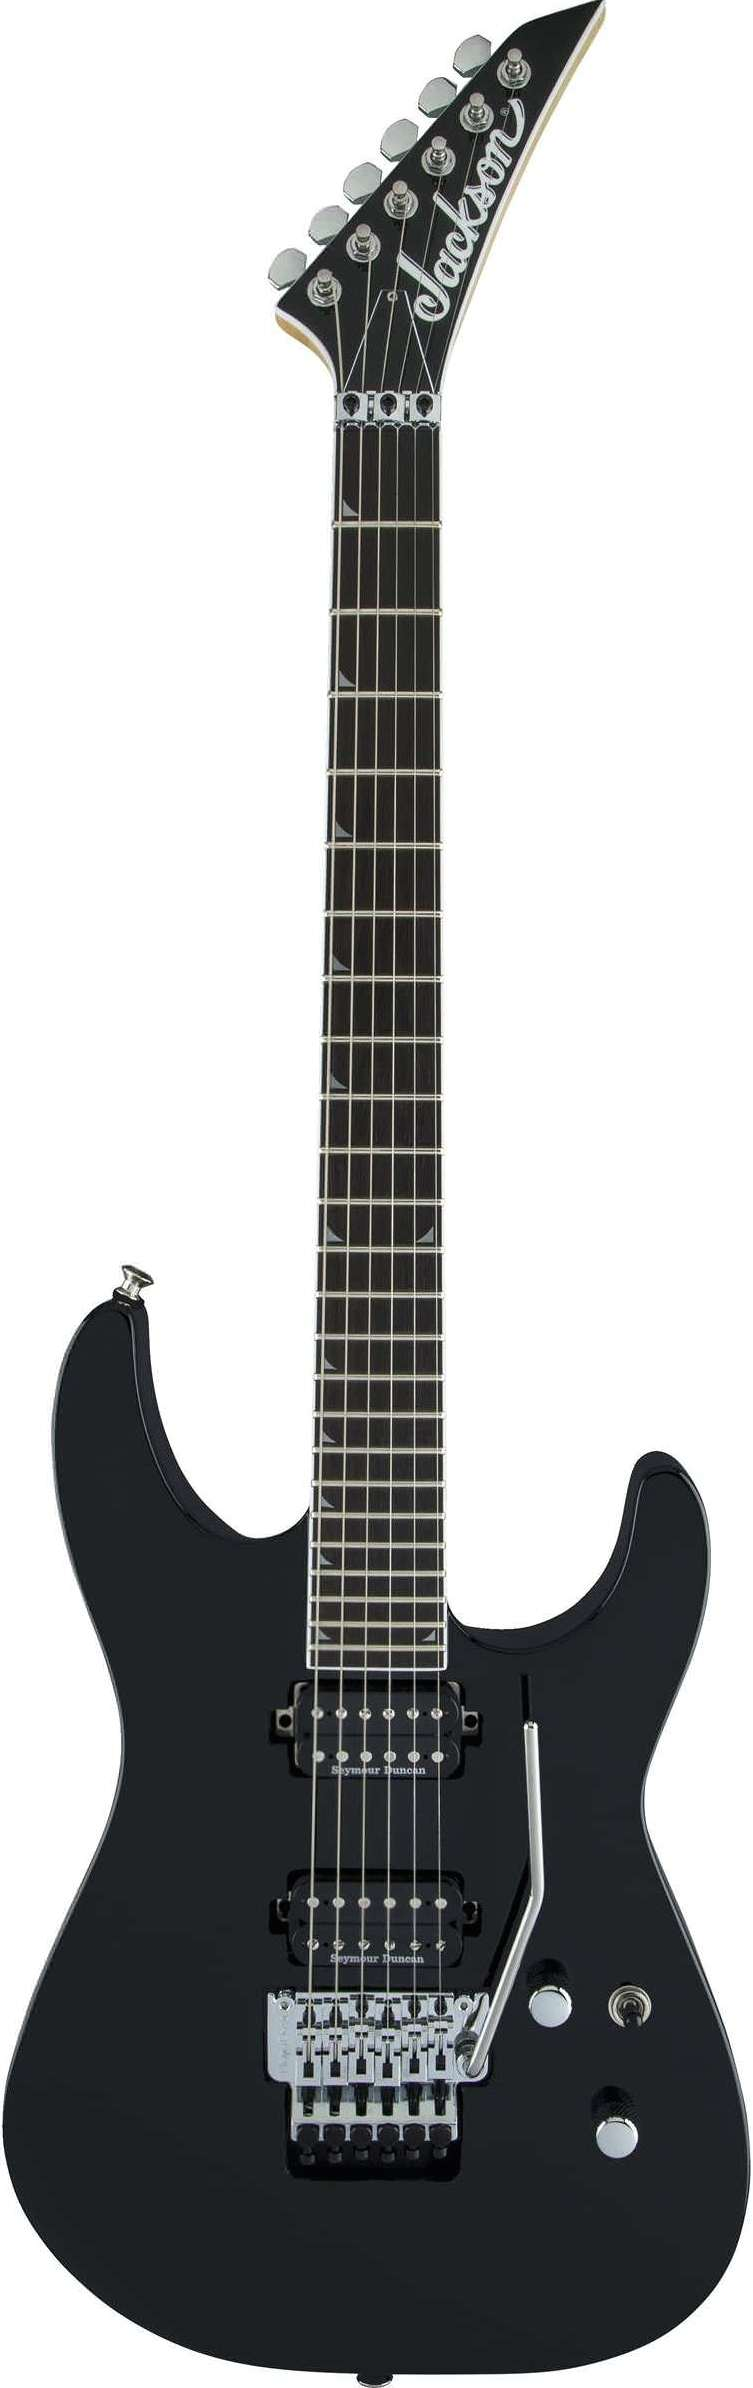 Электрогитара Jackson Pro SL2 - Gloss Black